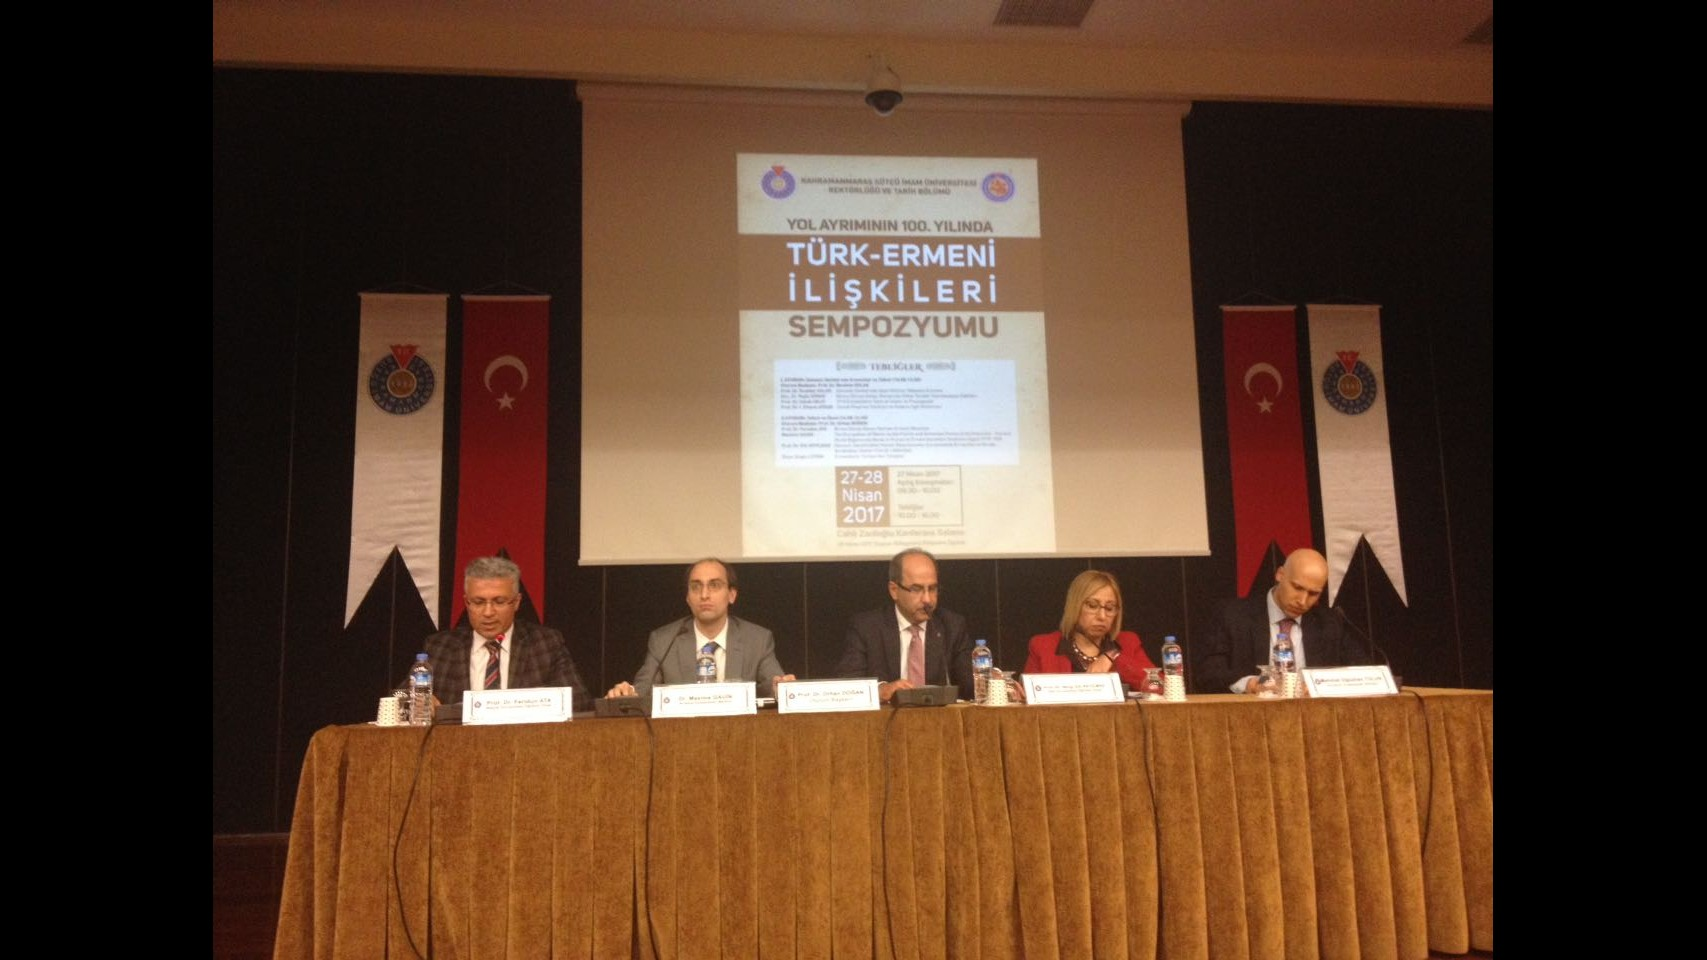 "A SYMPOSIUM TITLED ""TURKISH-ARMENIAN RELATIONS AT THE 100. YEAR OF THE JUNCTION"" WAS ORGANIZED IN KAHRAMANMARAŞ SÜTÇÜ İMAM UNIVERSITY"